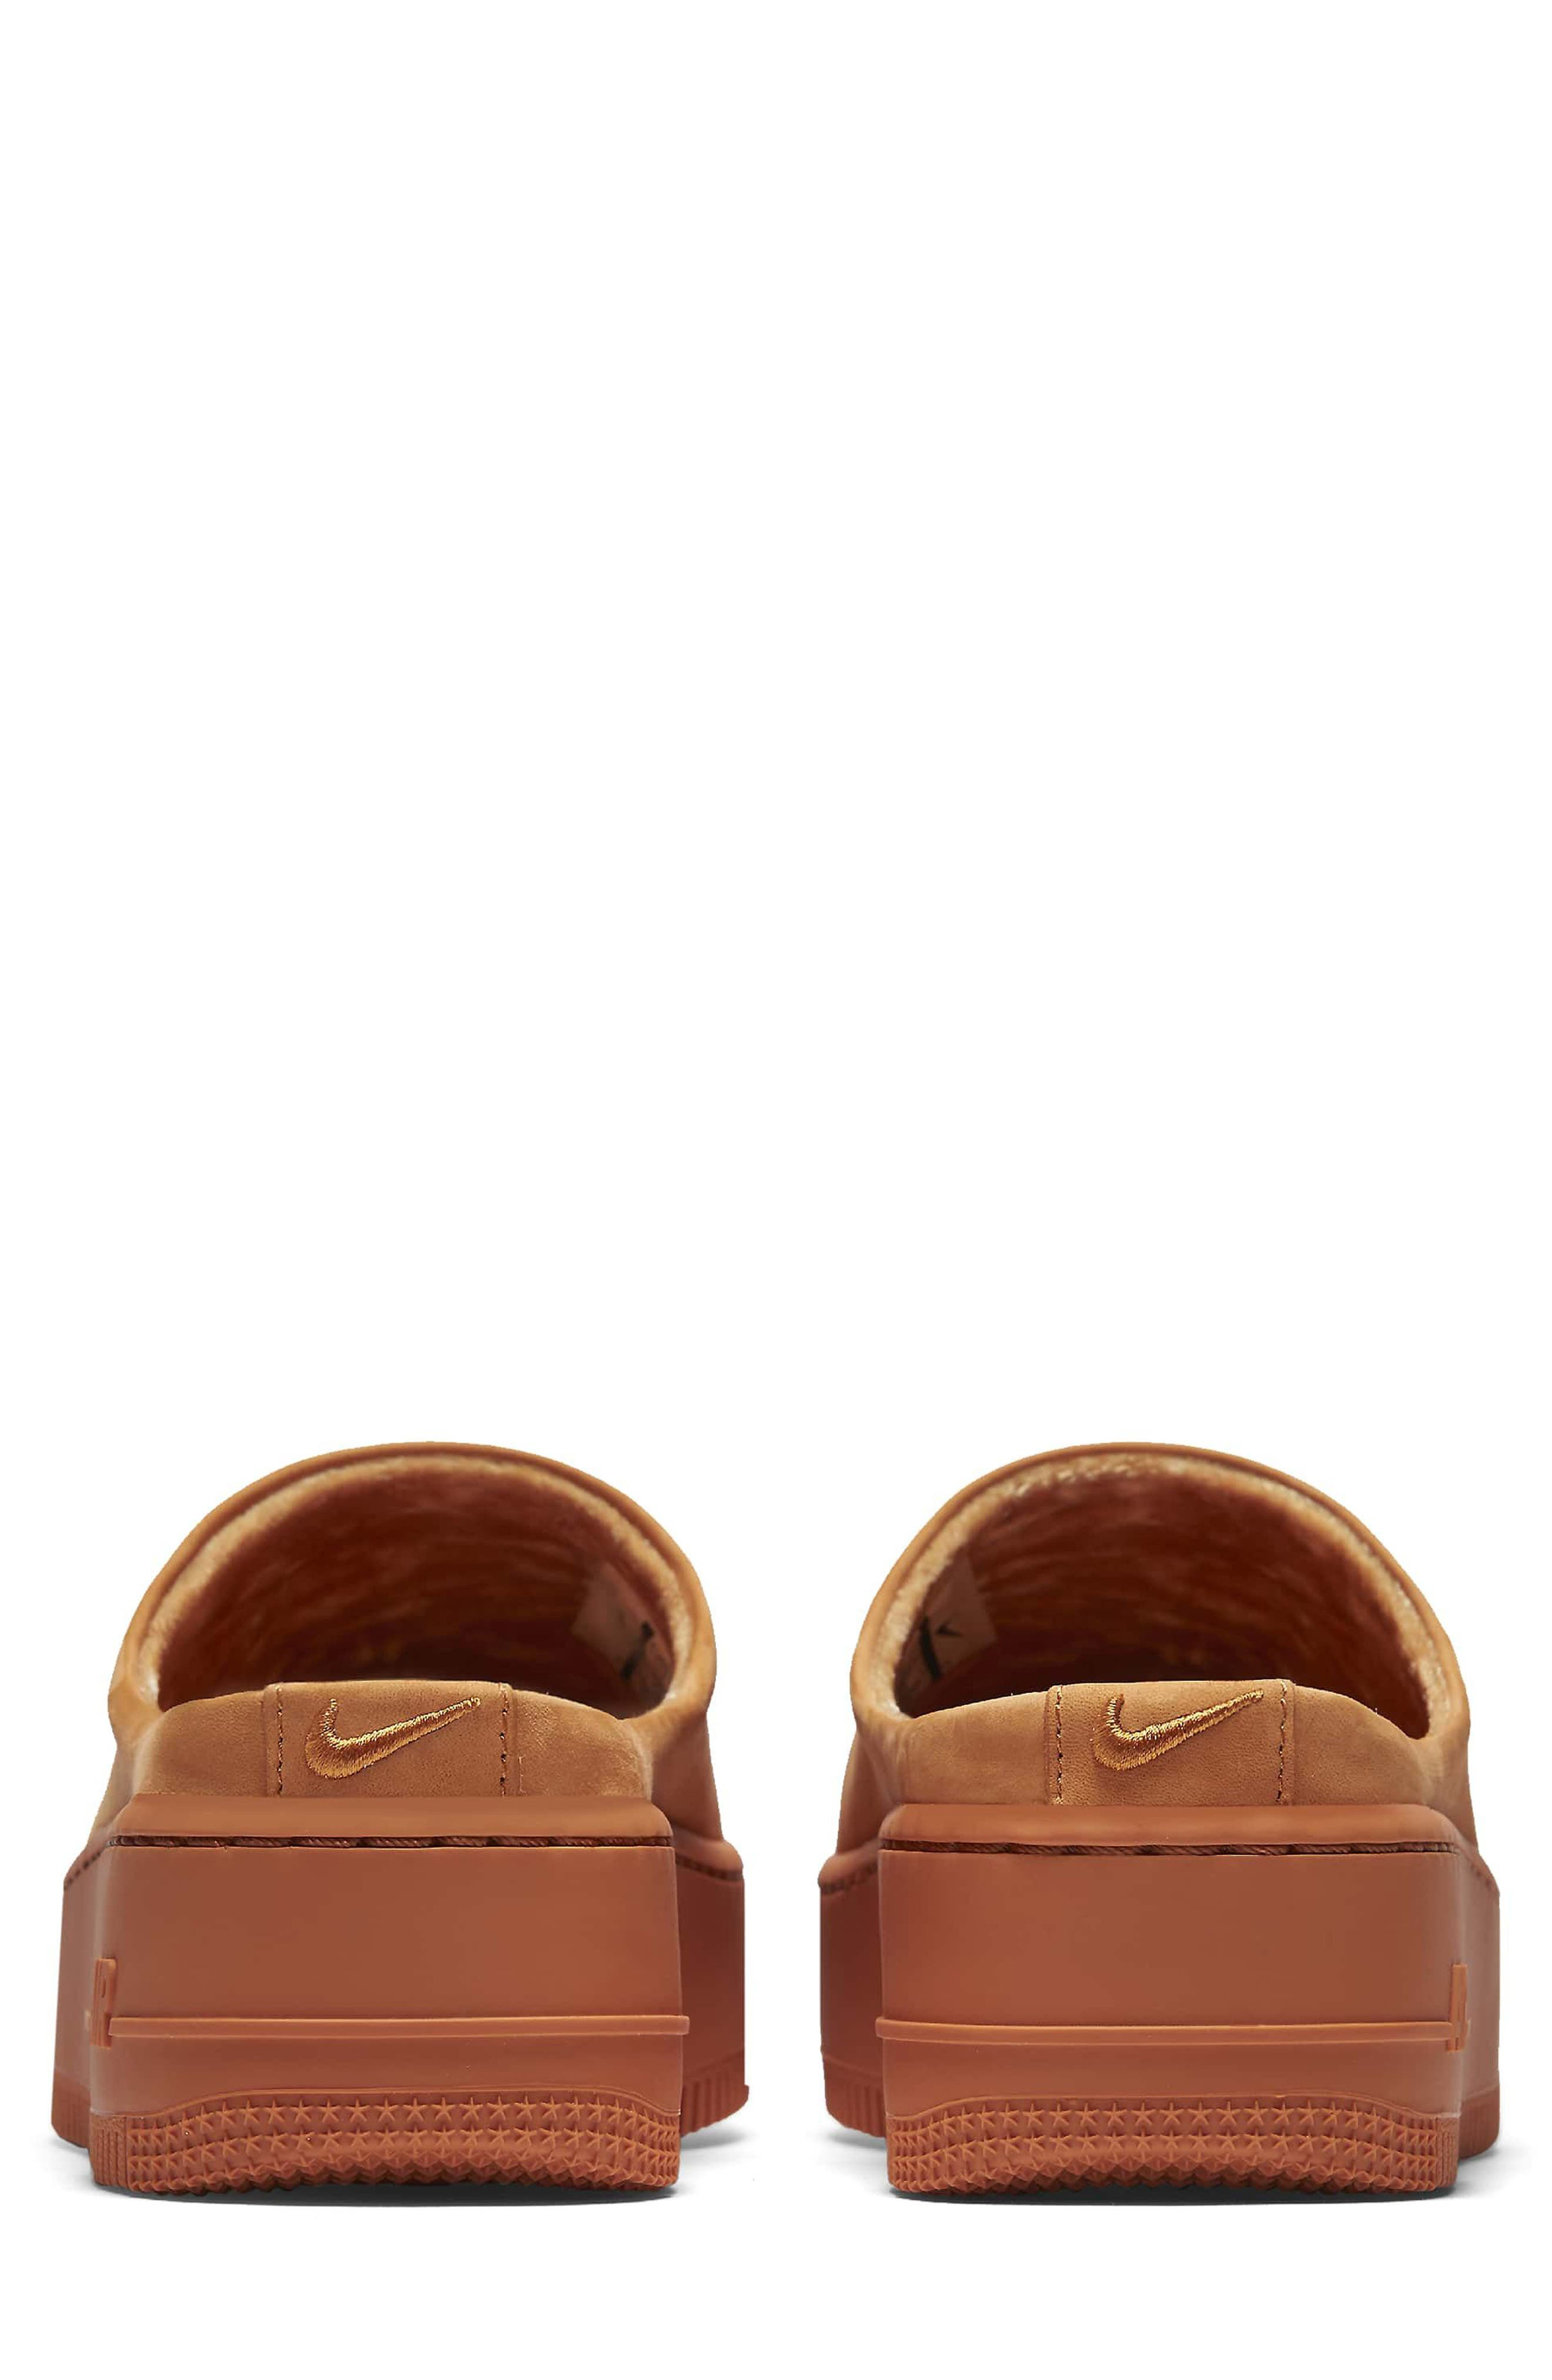 Air Force 1 Lover XX Slip-On Mule Sneaker,                             Alternate thumbnail 2, color,                             Cinder Orange